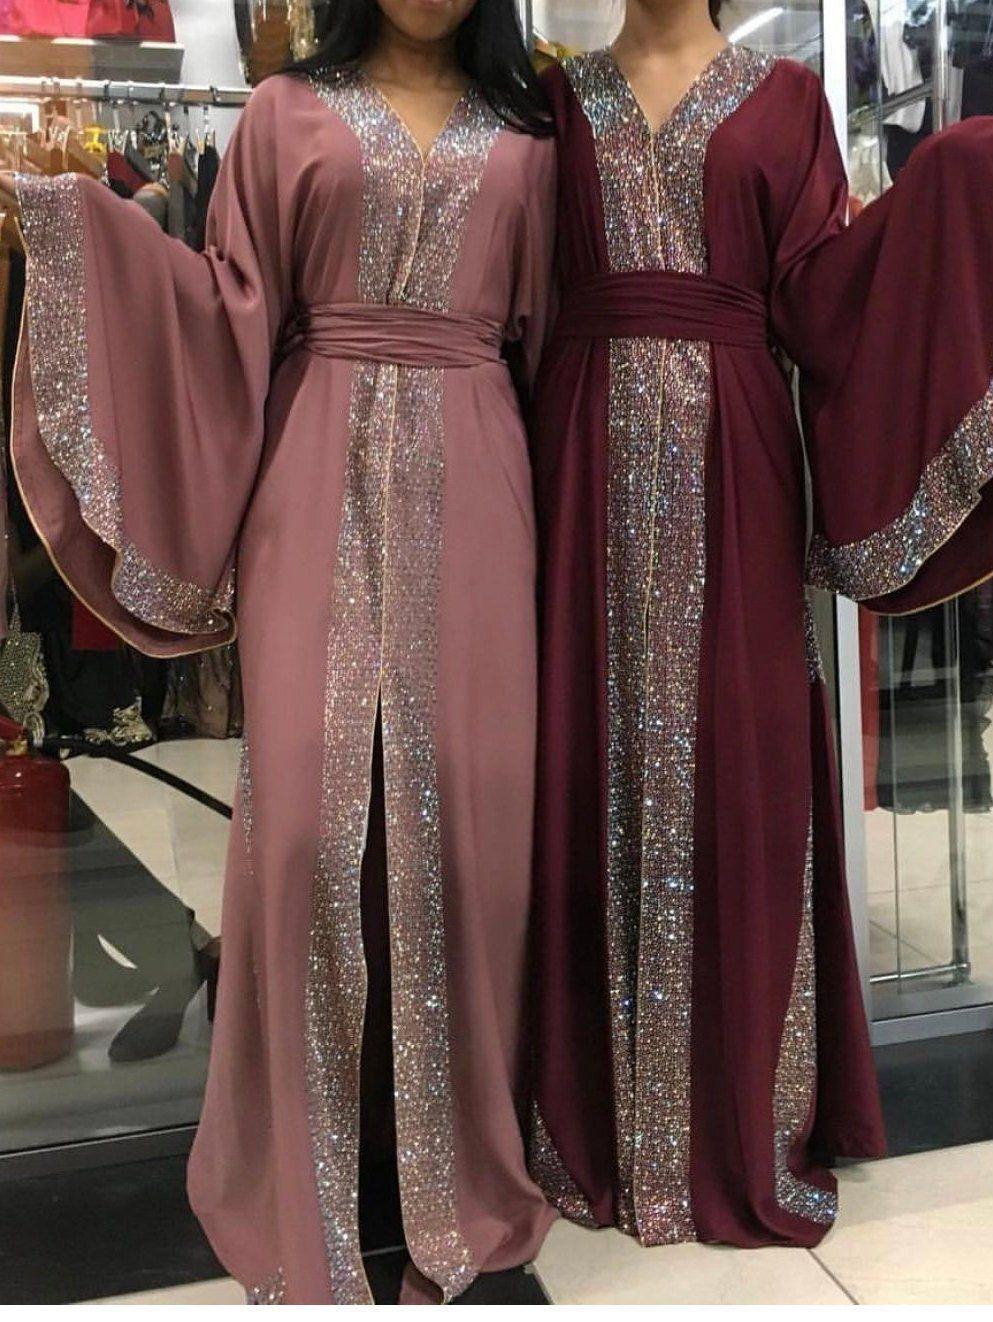 Amazing Detailed Farasha with Pearl-Like Stones All Around Dubai Morocco Dress